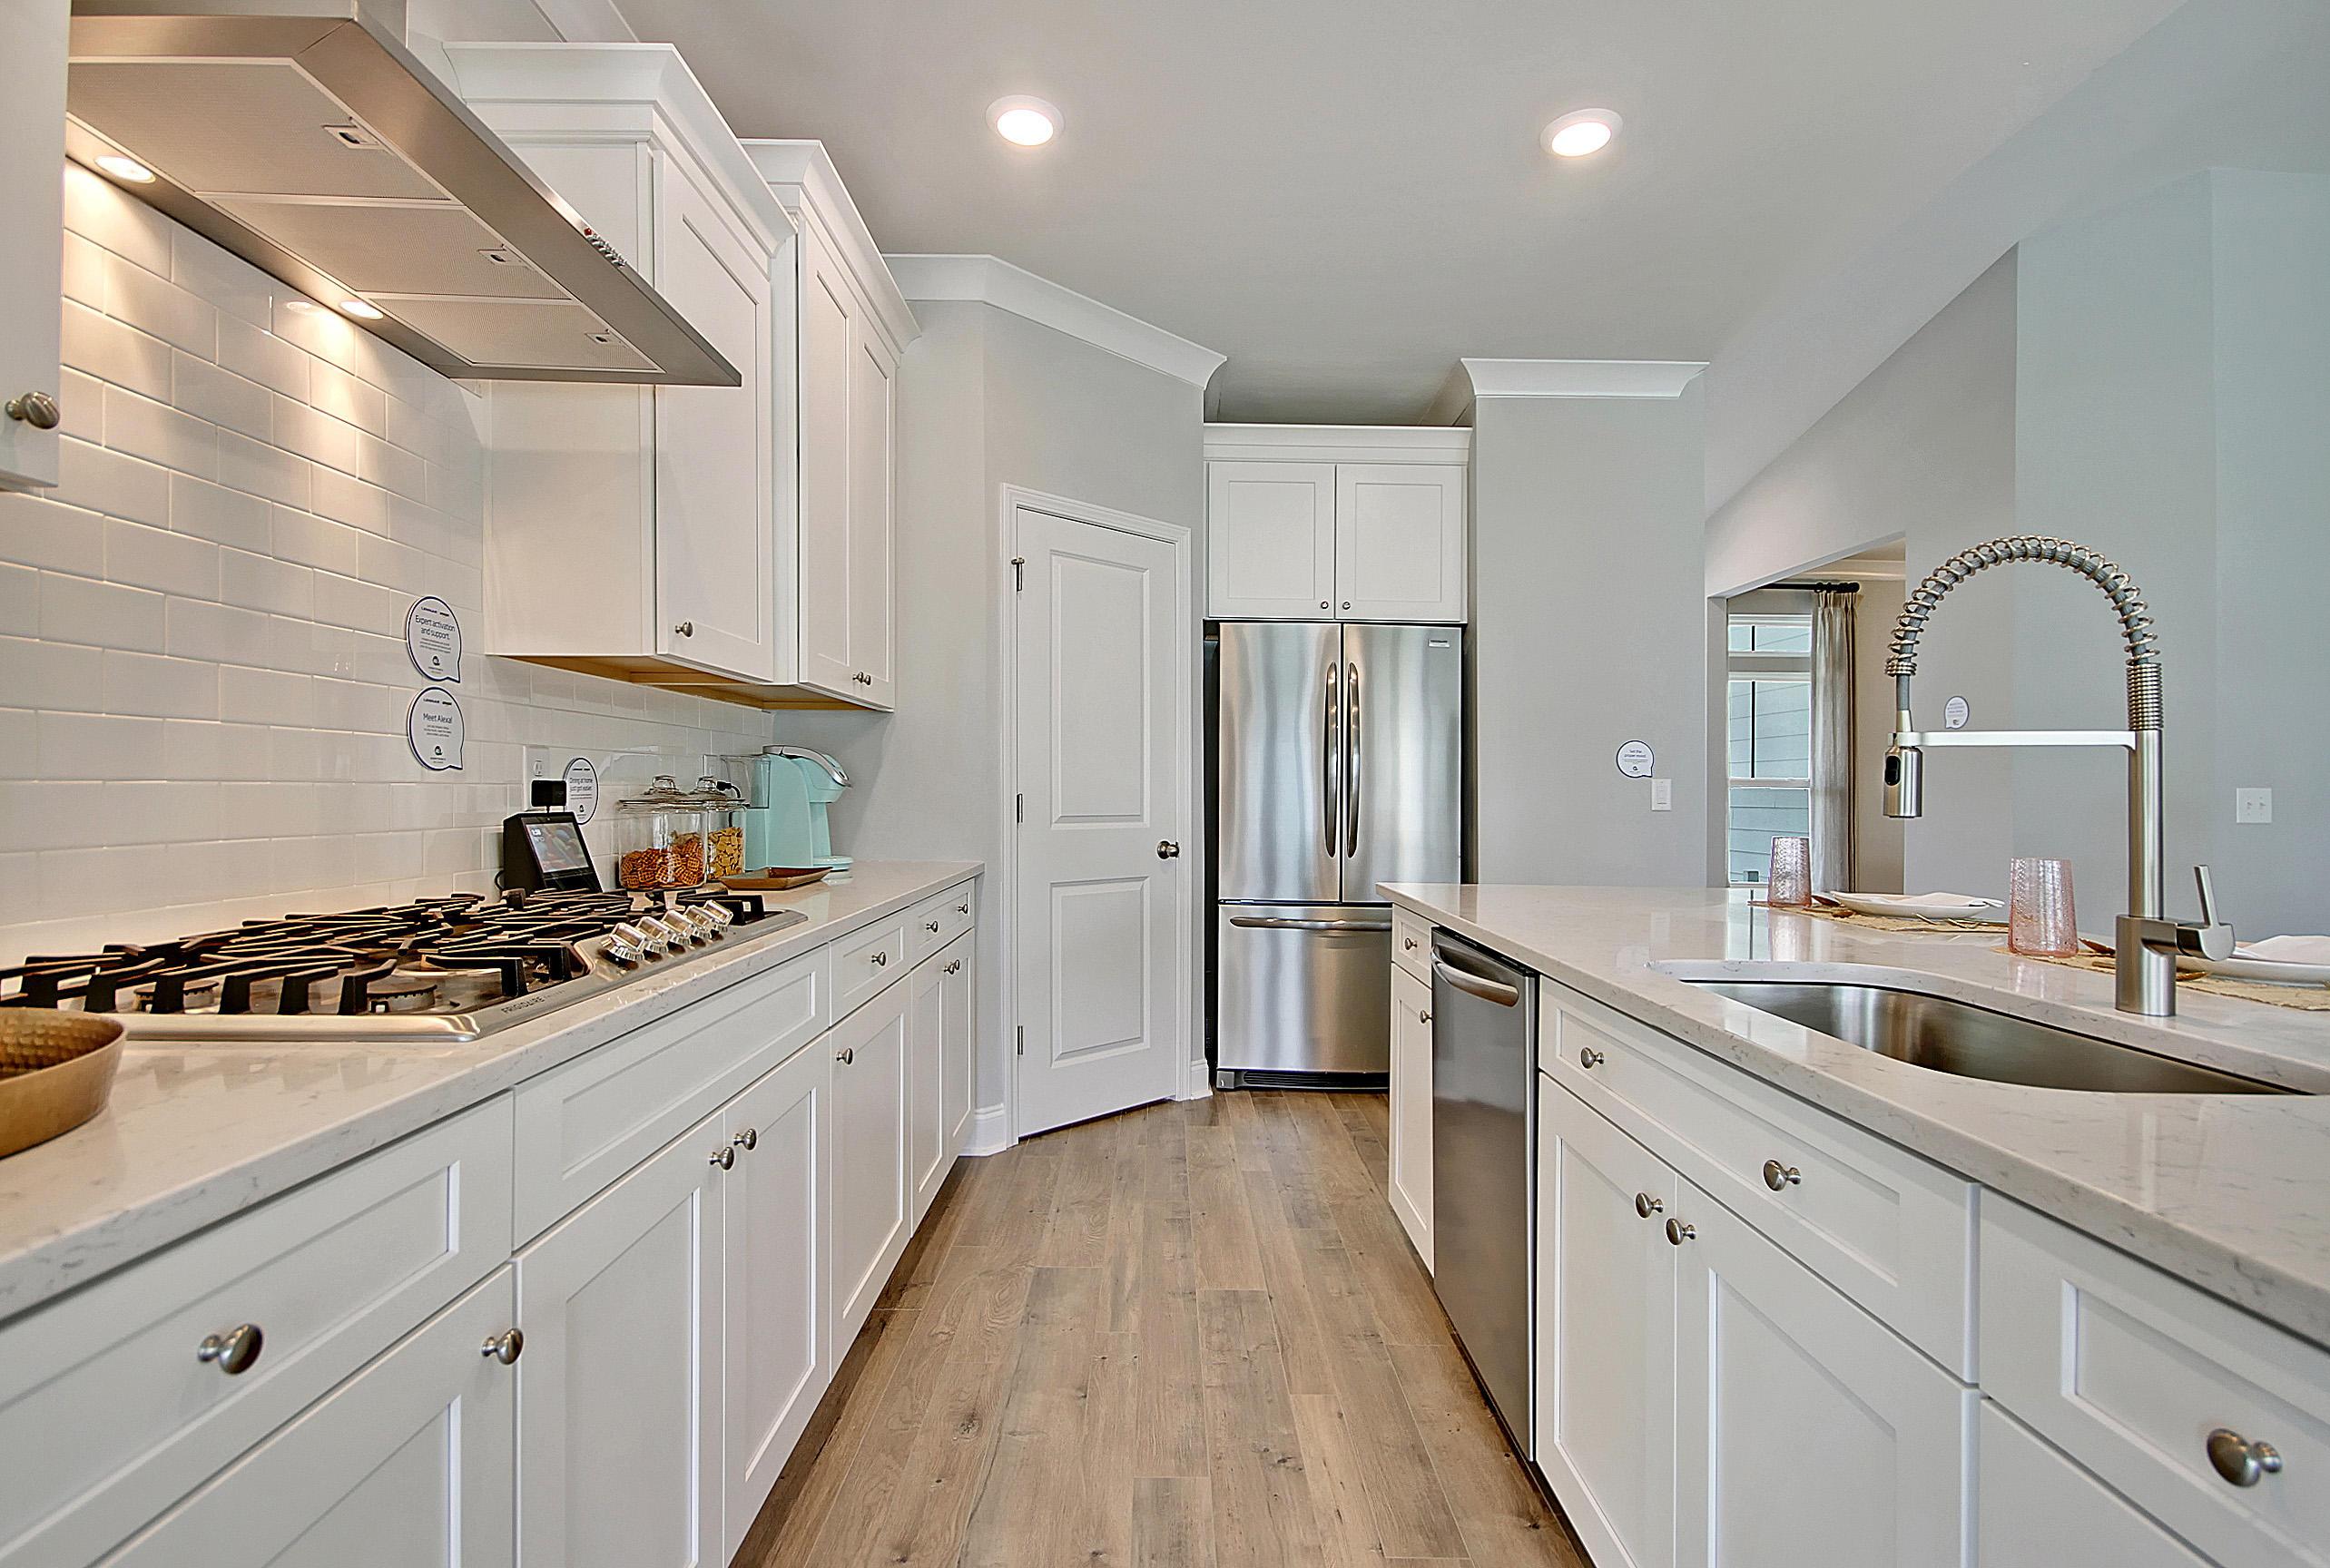 Park West Homes For Sale - 3066 Rice Field, Mount Pleasant, SC - 17